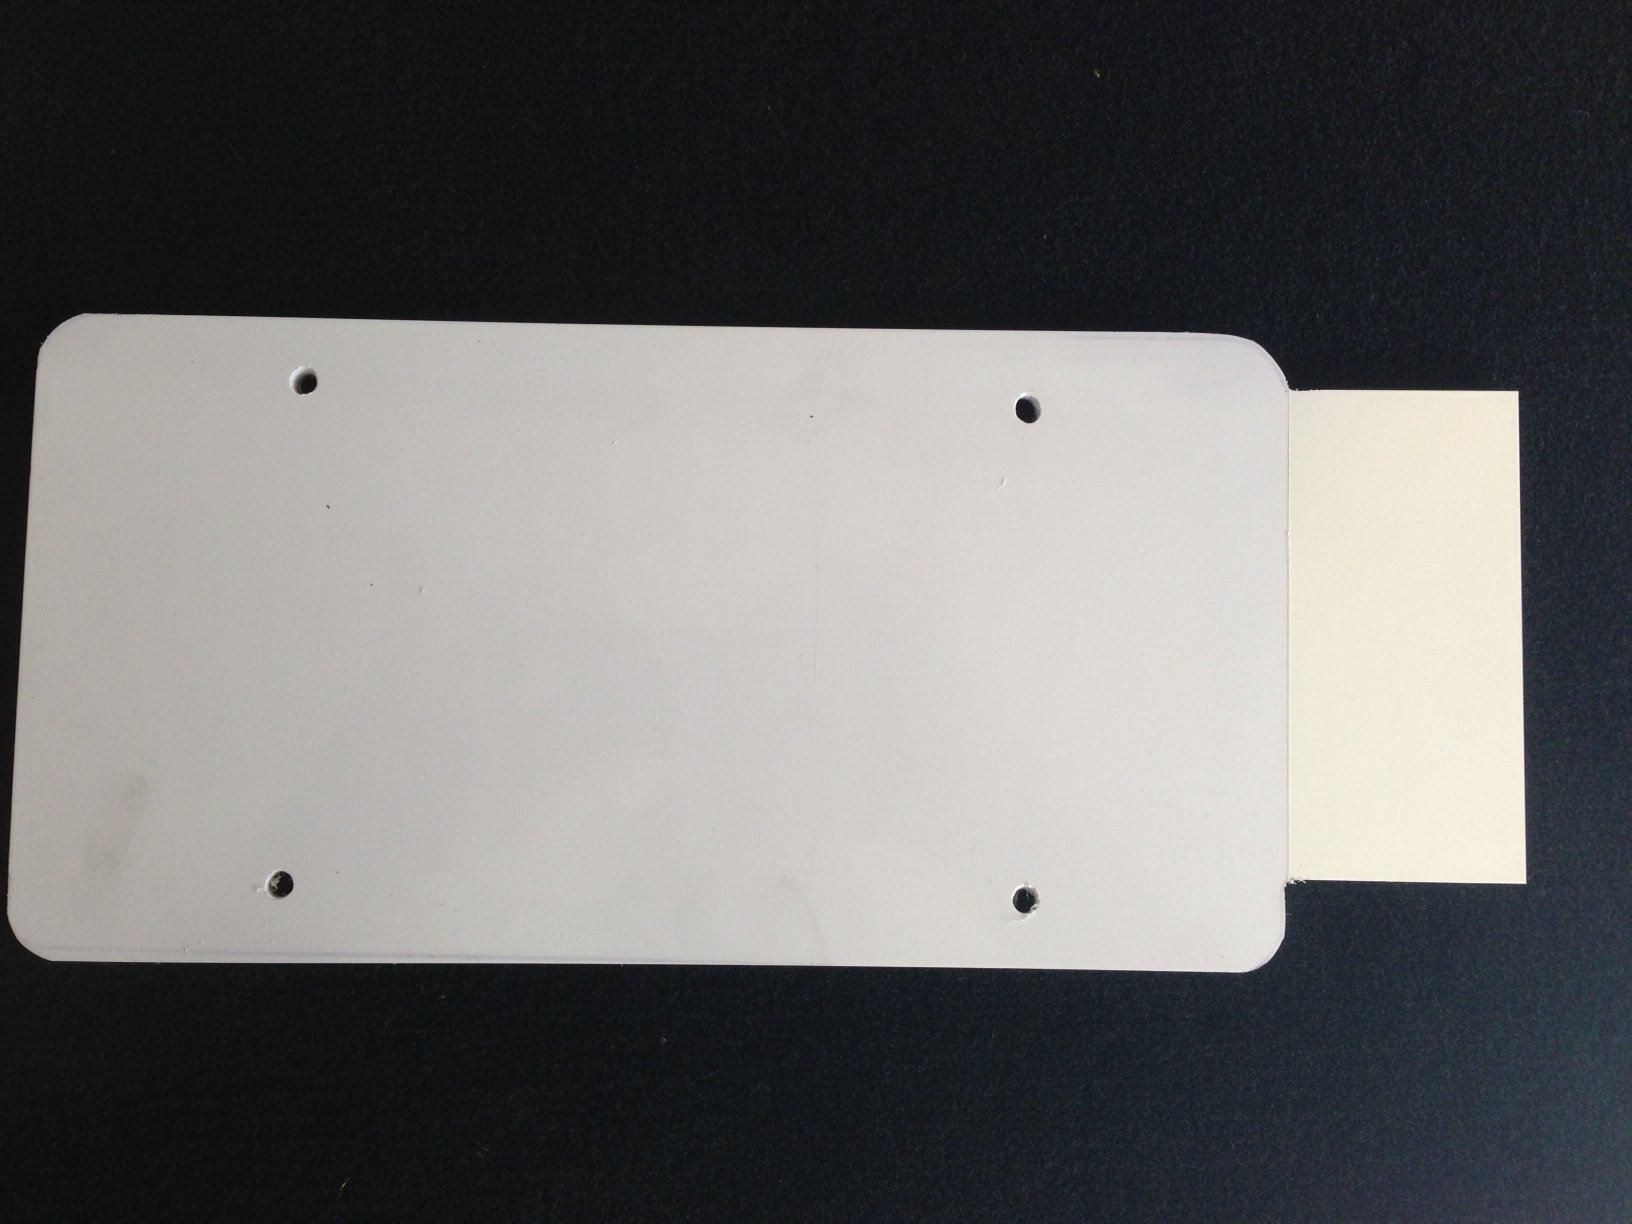 Plastic_Plate1.JPG